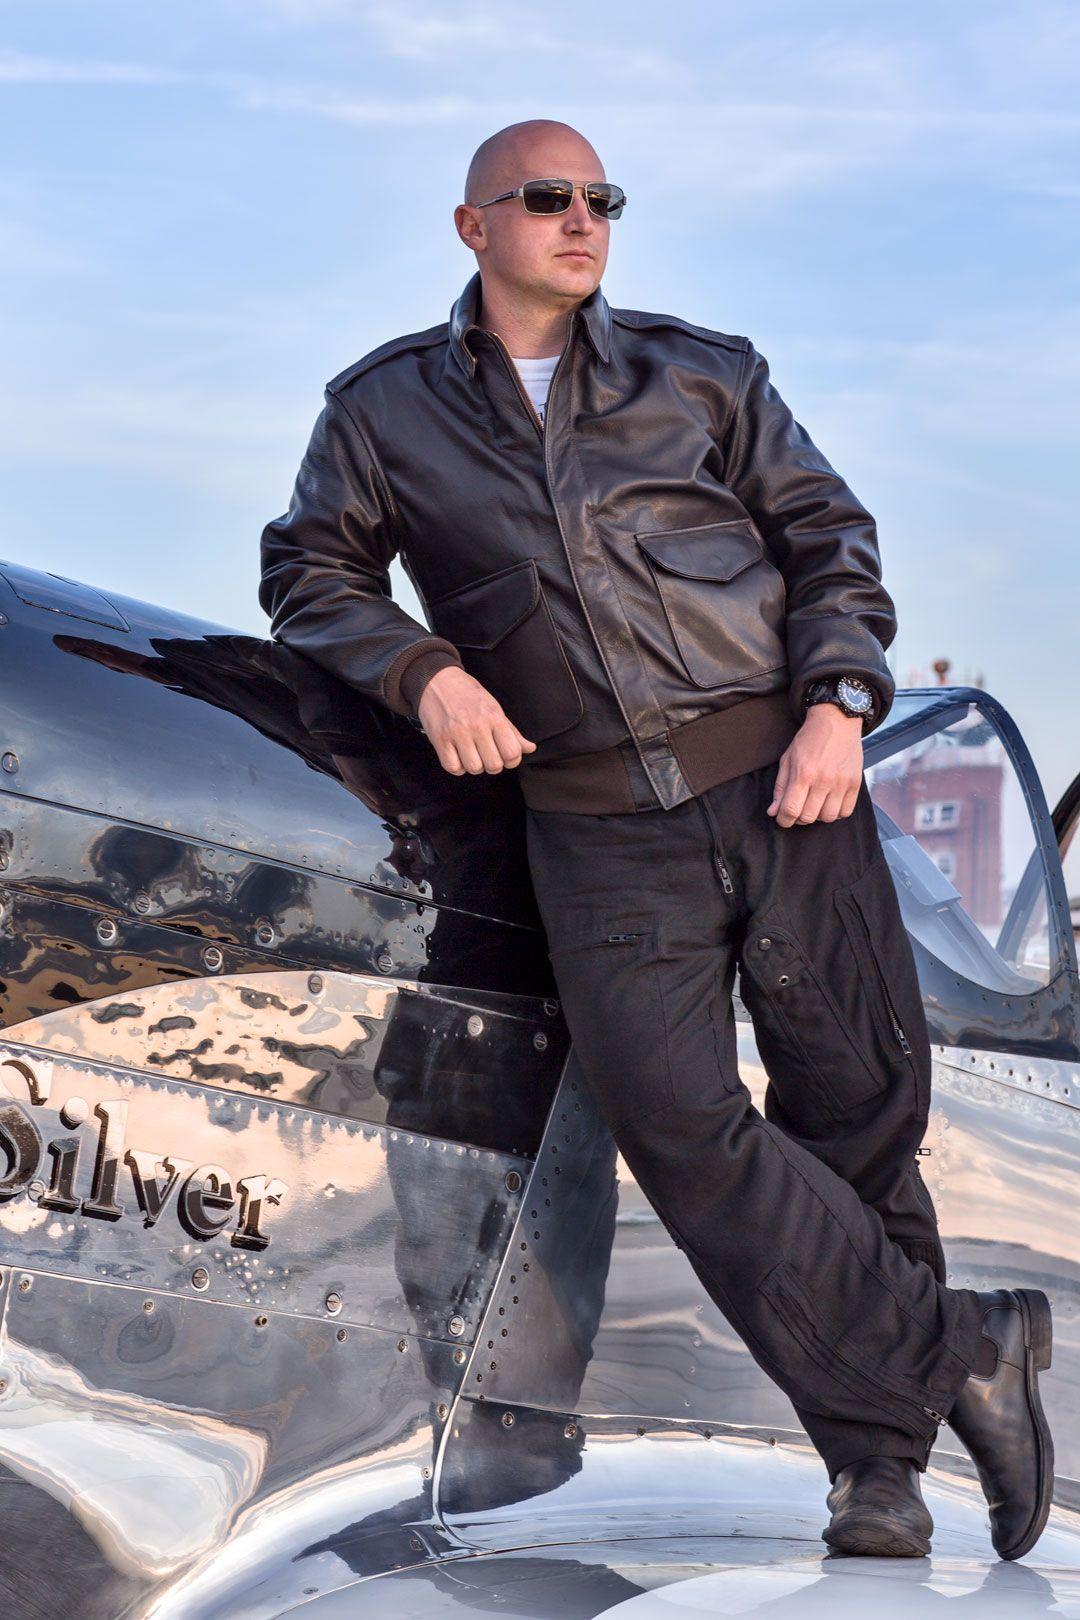 U.S.A.F. 21st. Century A2 Jacket Jackets, Aviator